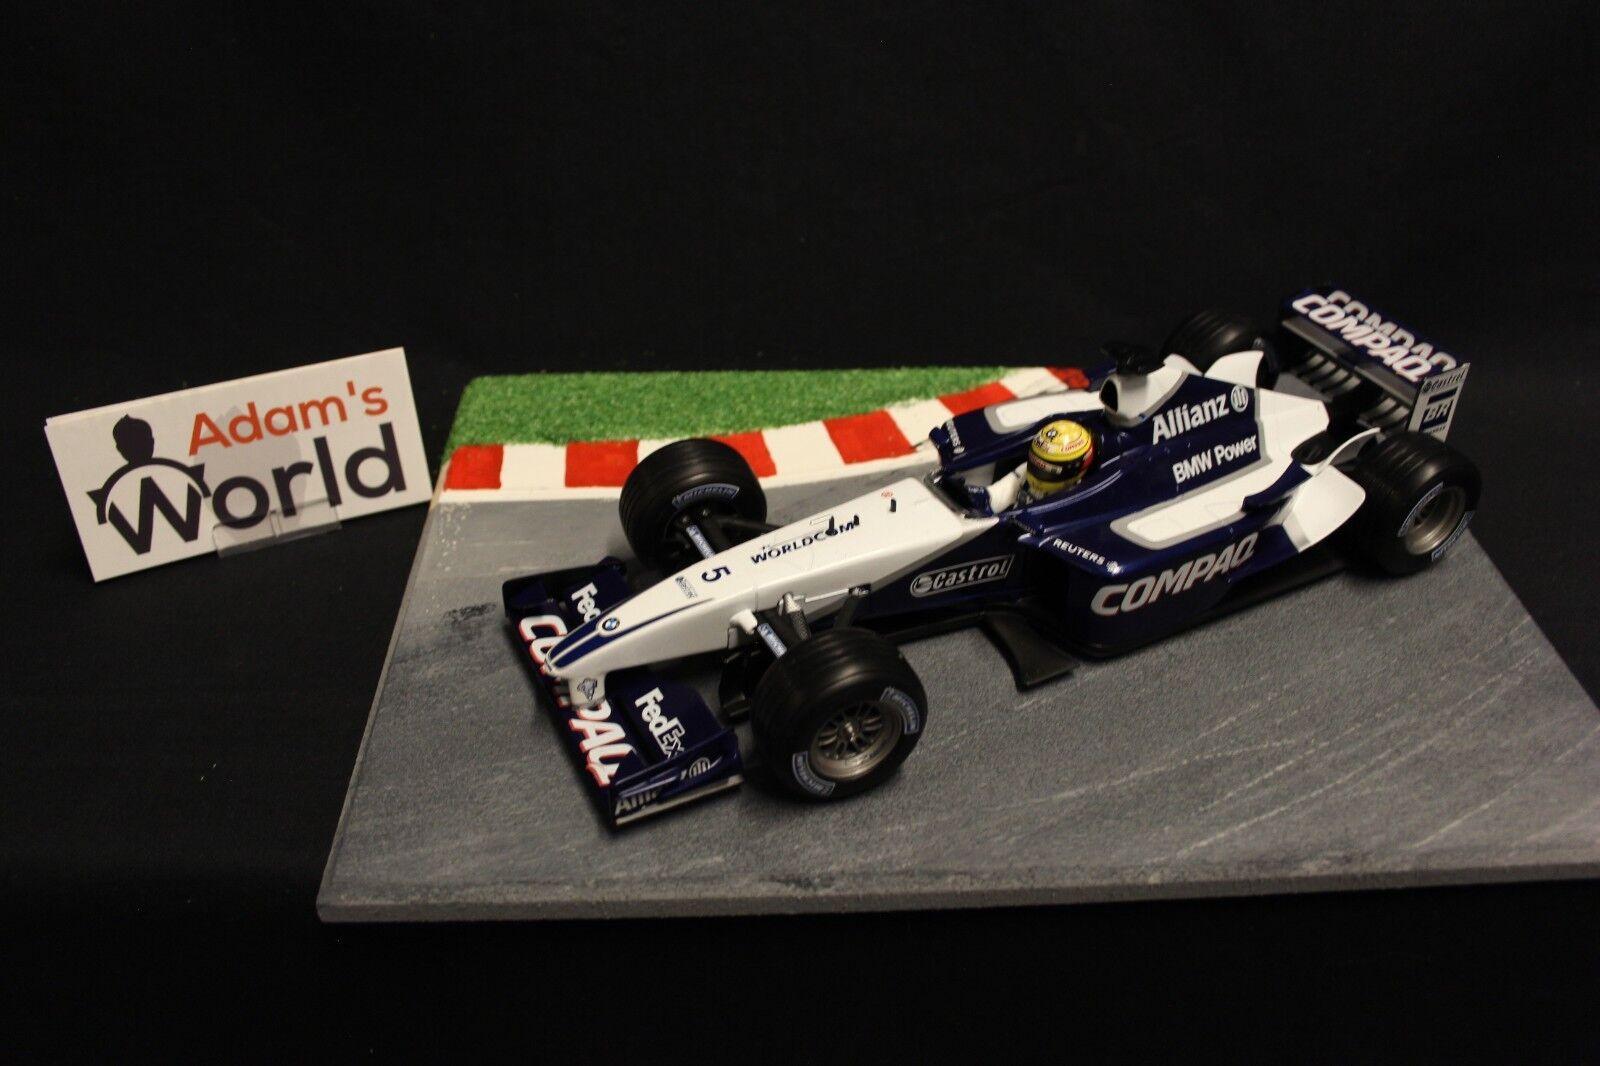 heta hjul Williams BMW FW24 2002 1 18 Ralf Schumacher (GER) (F1NB)